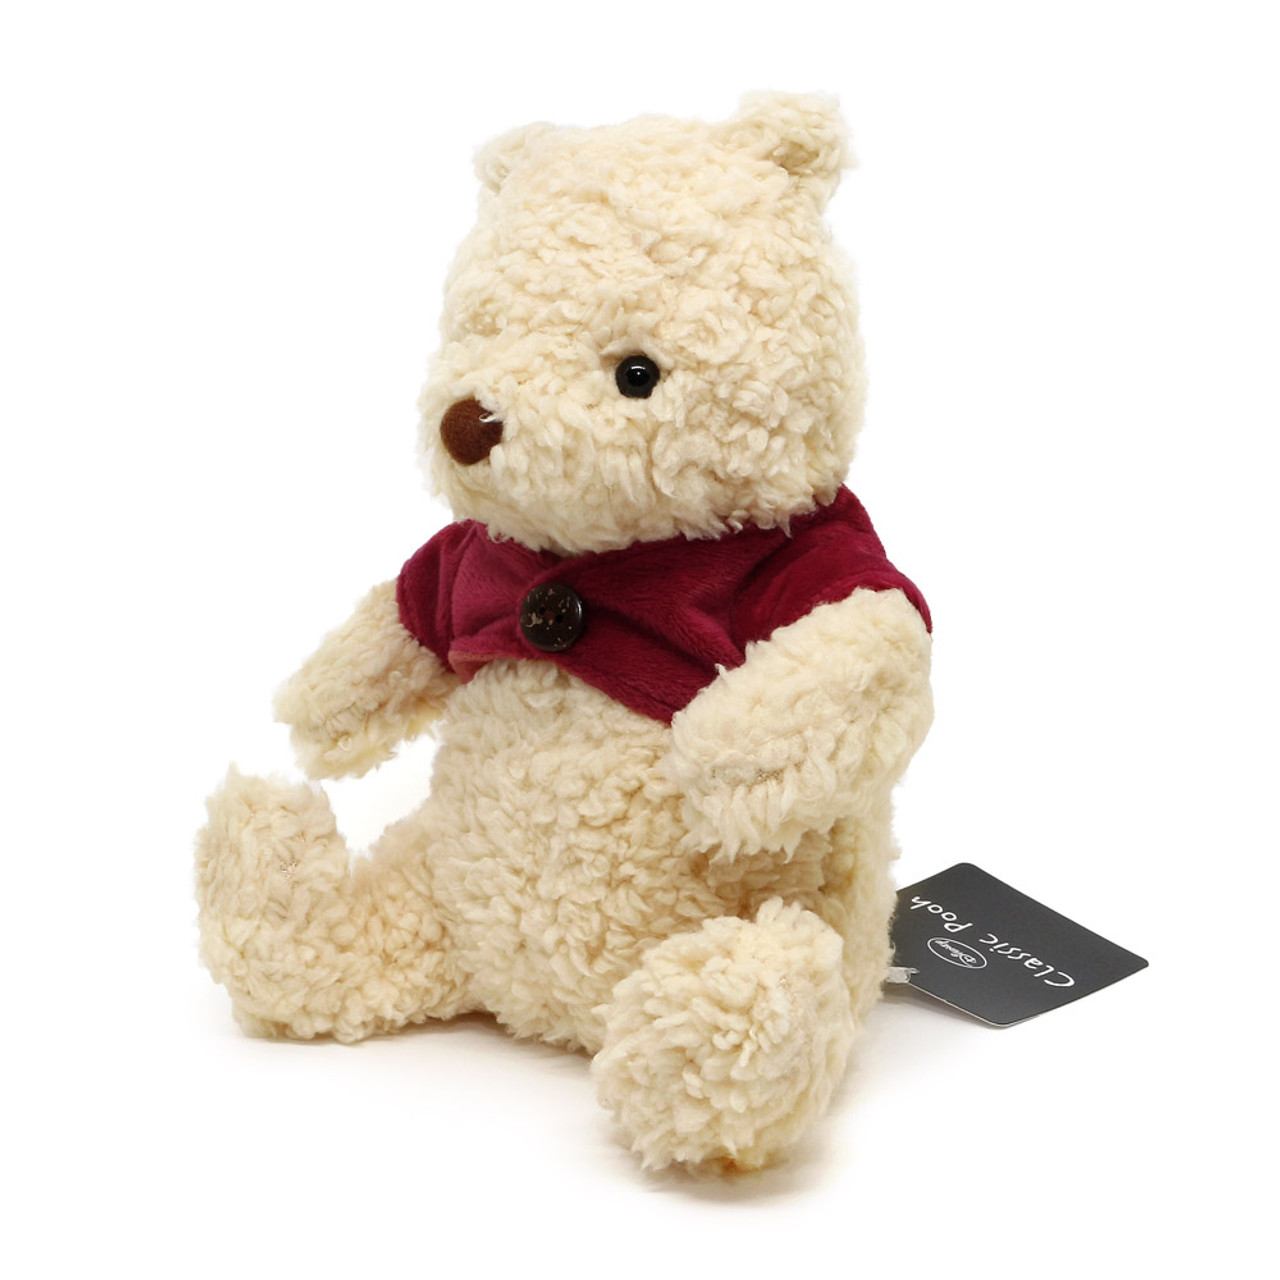 Disney Winnie The Pooh Classic Fluffy Stuffed Animal ( Side View )